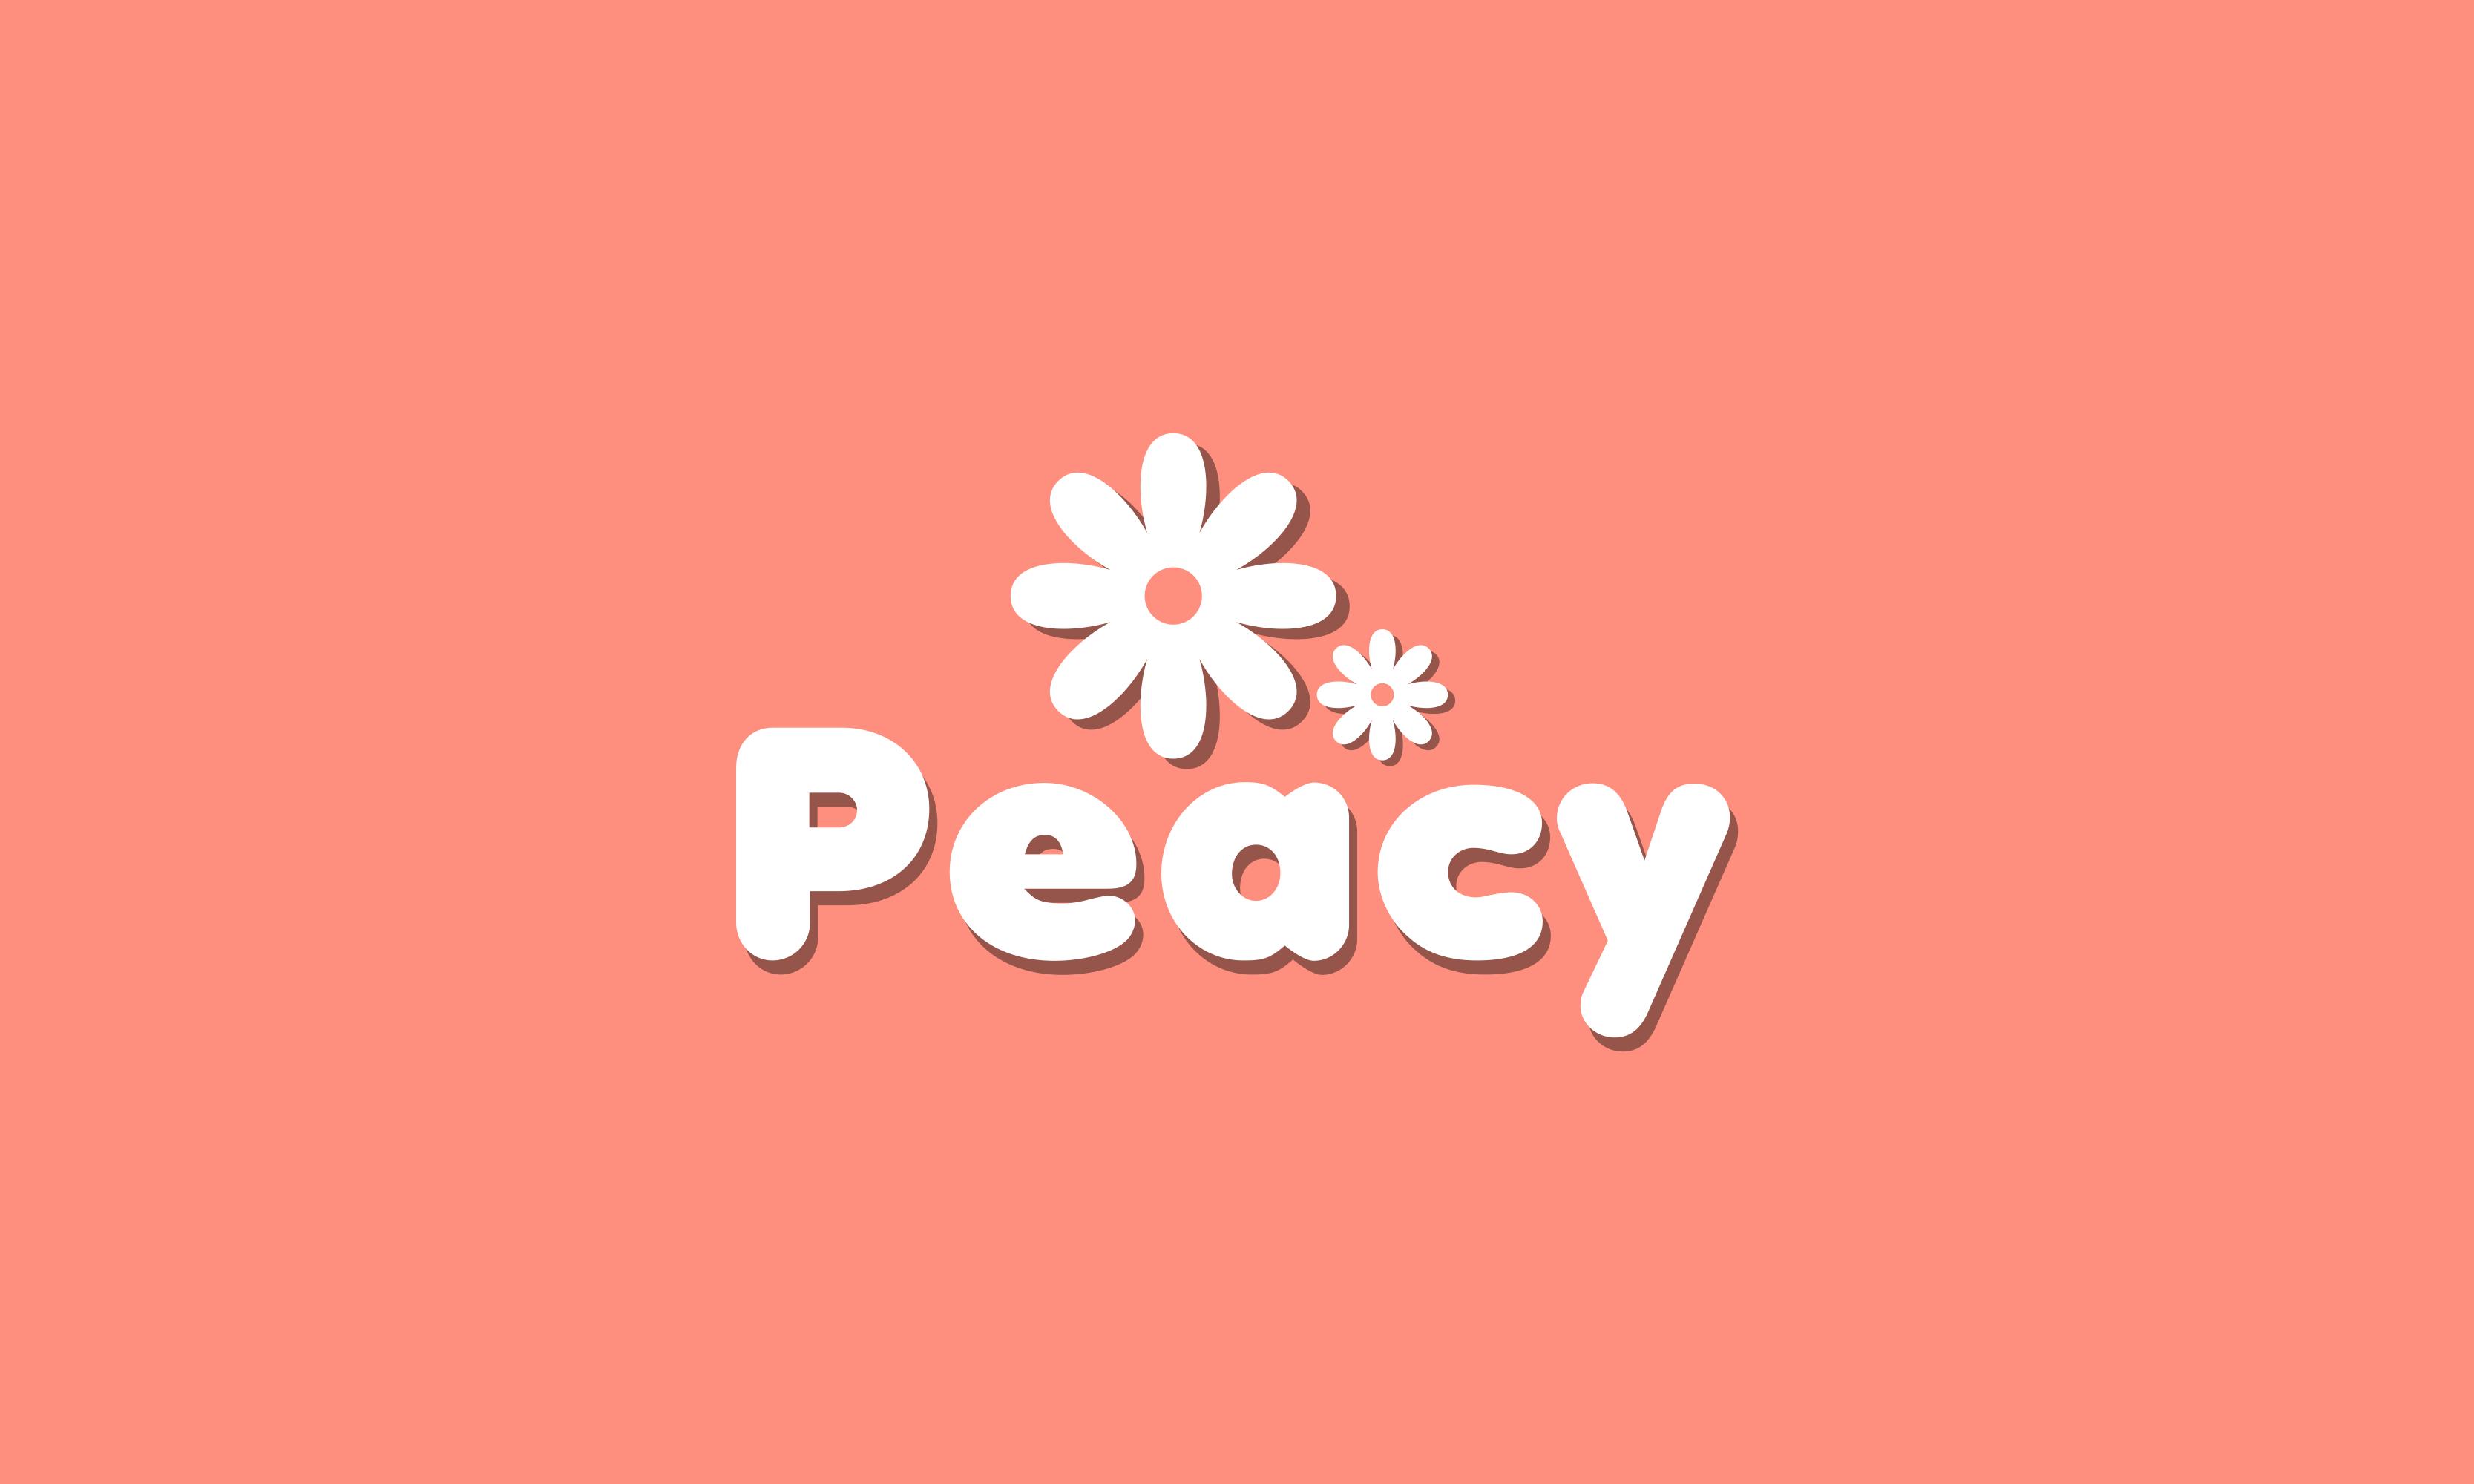 Peacy